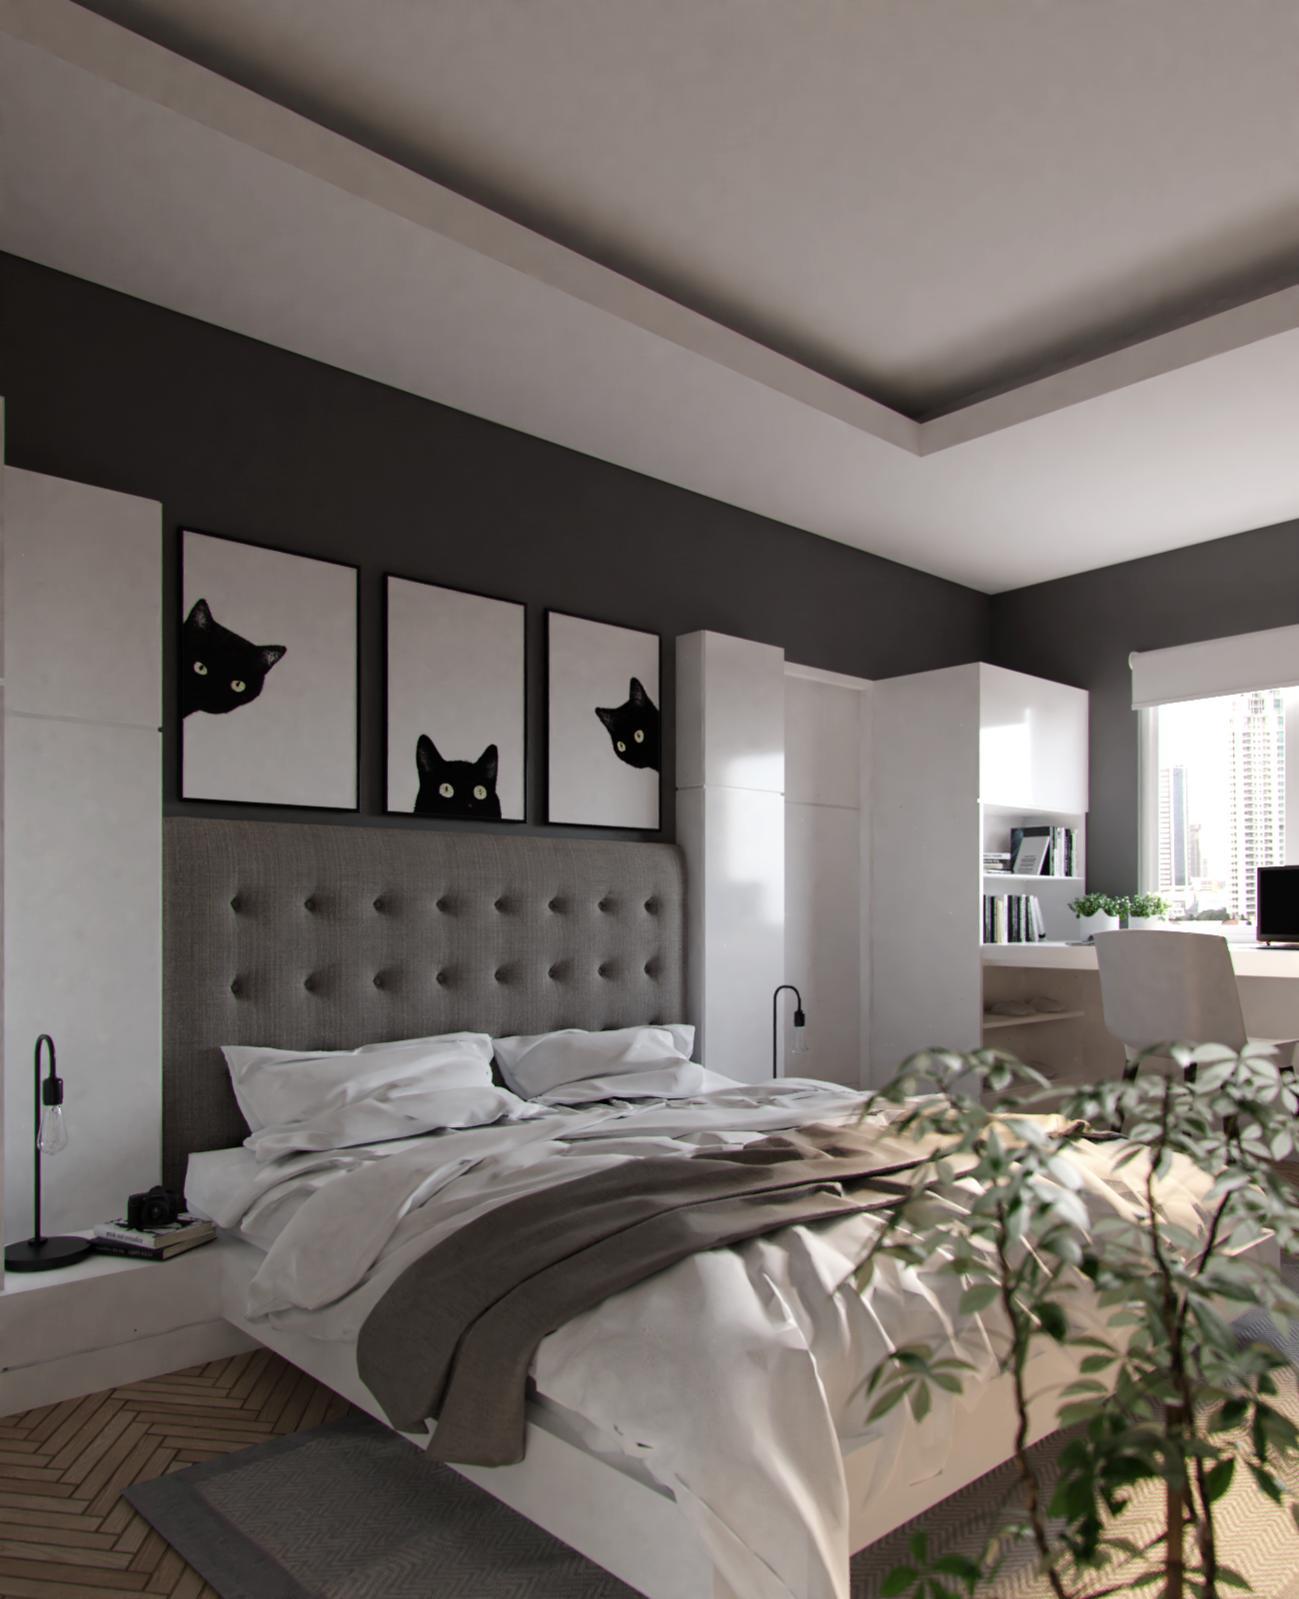 White-Grey Bedroom - Forum Gallery - Blender Artists Community